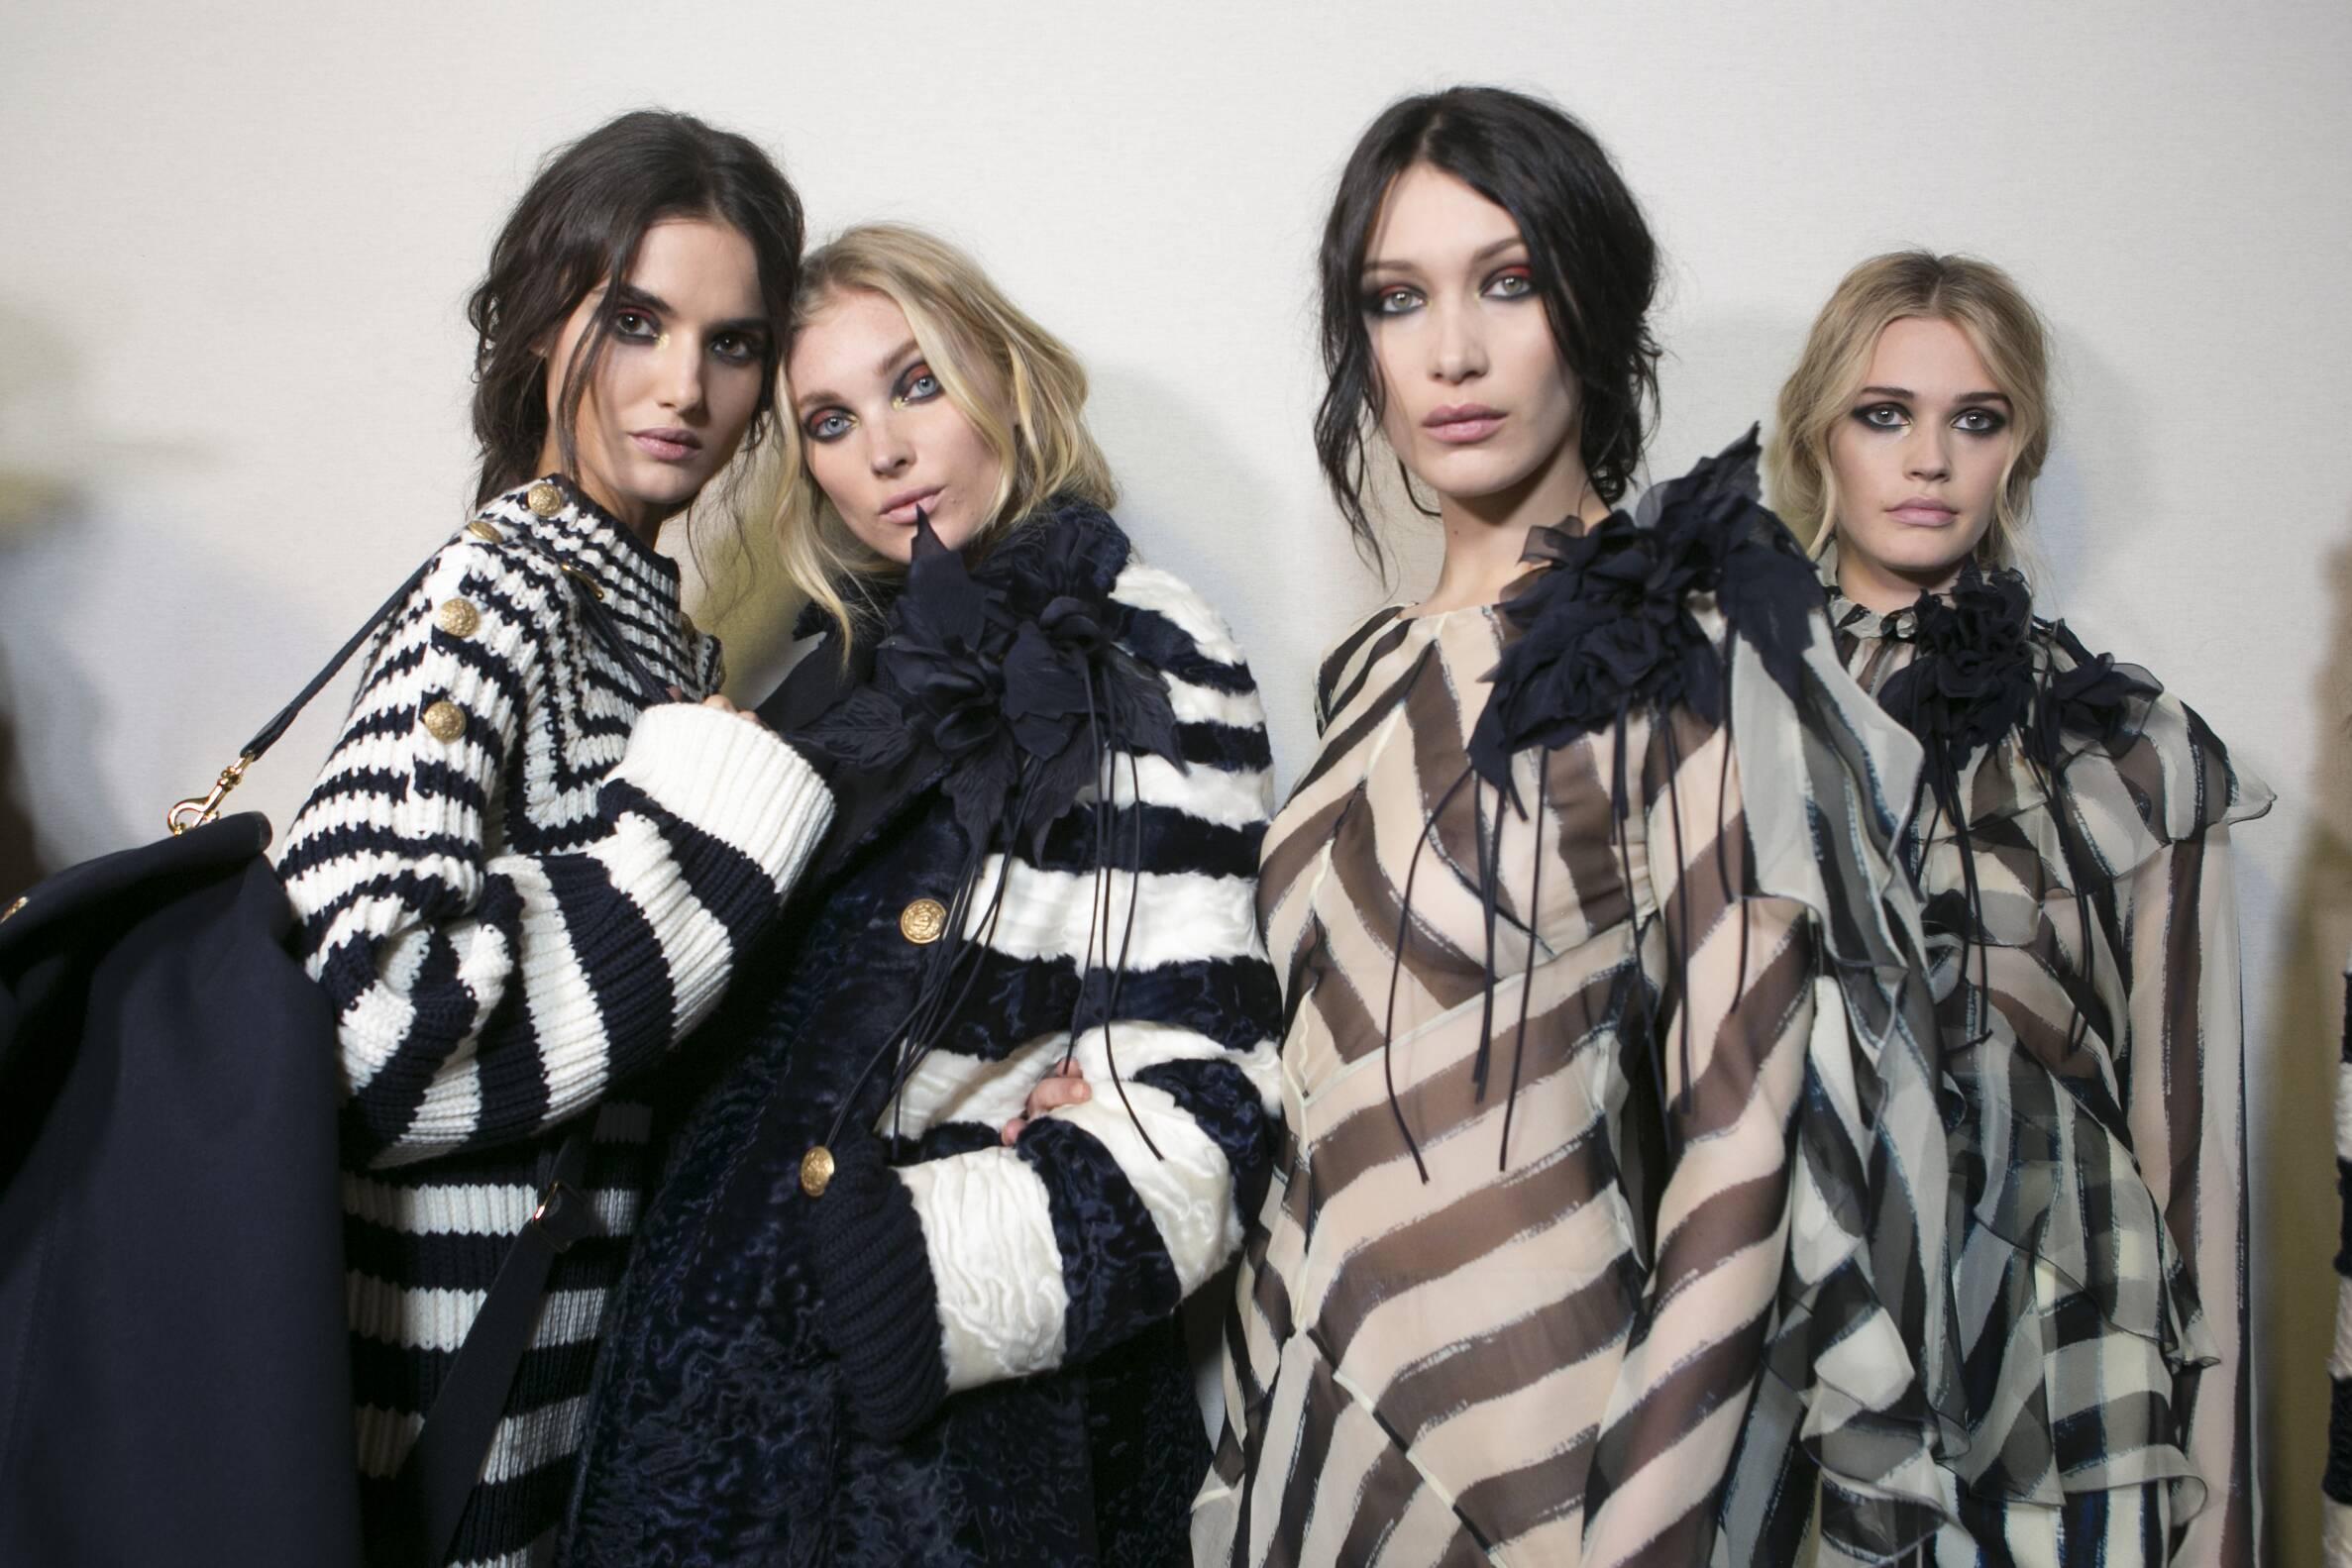 Backstage Alberta Ferretti Models Milan Fashion Week